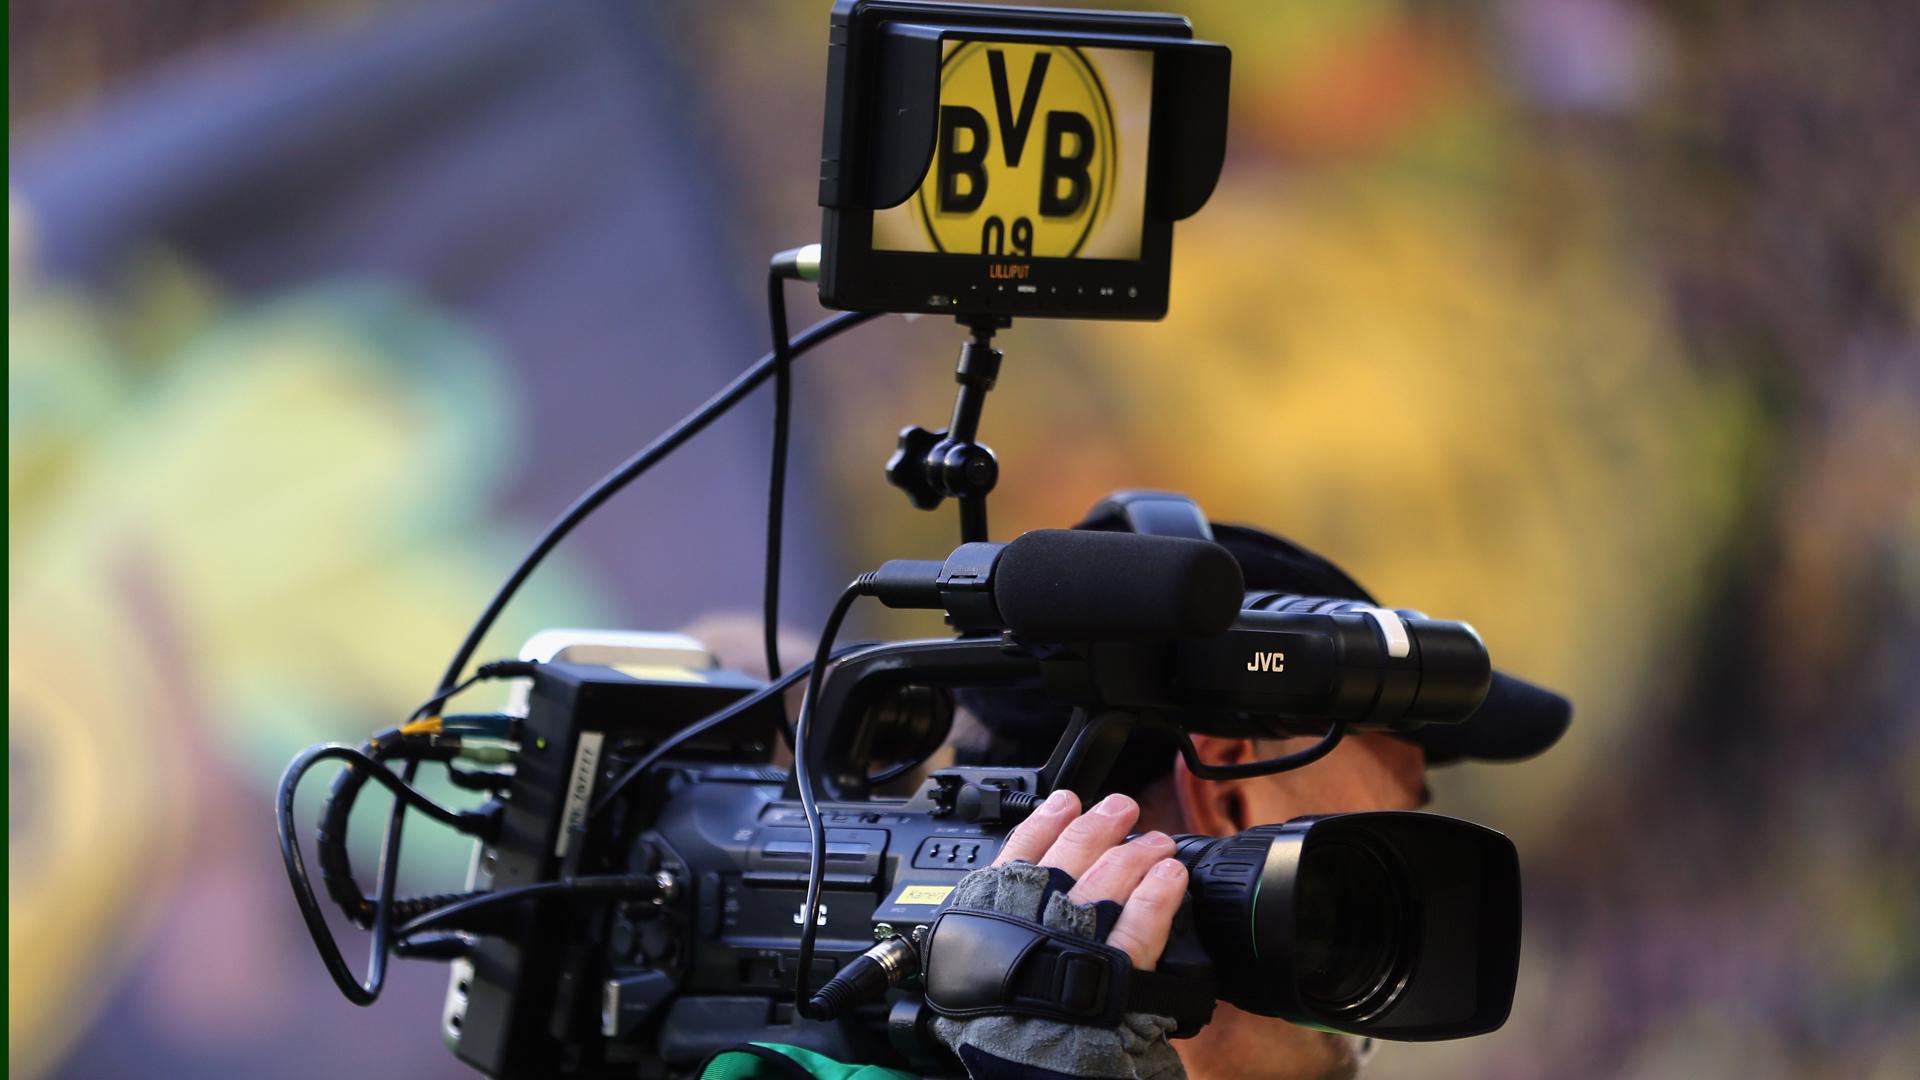 bvb hertha livestream